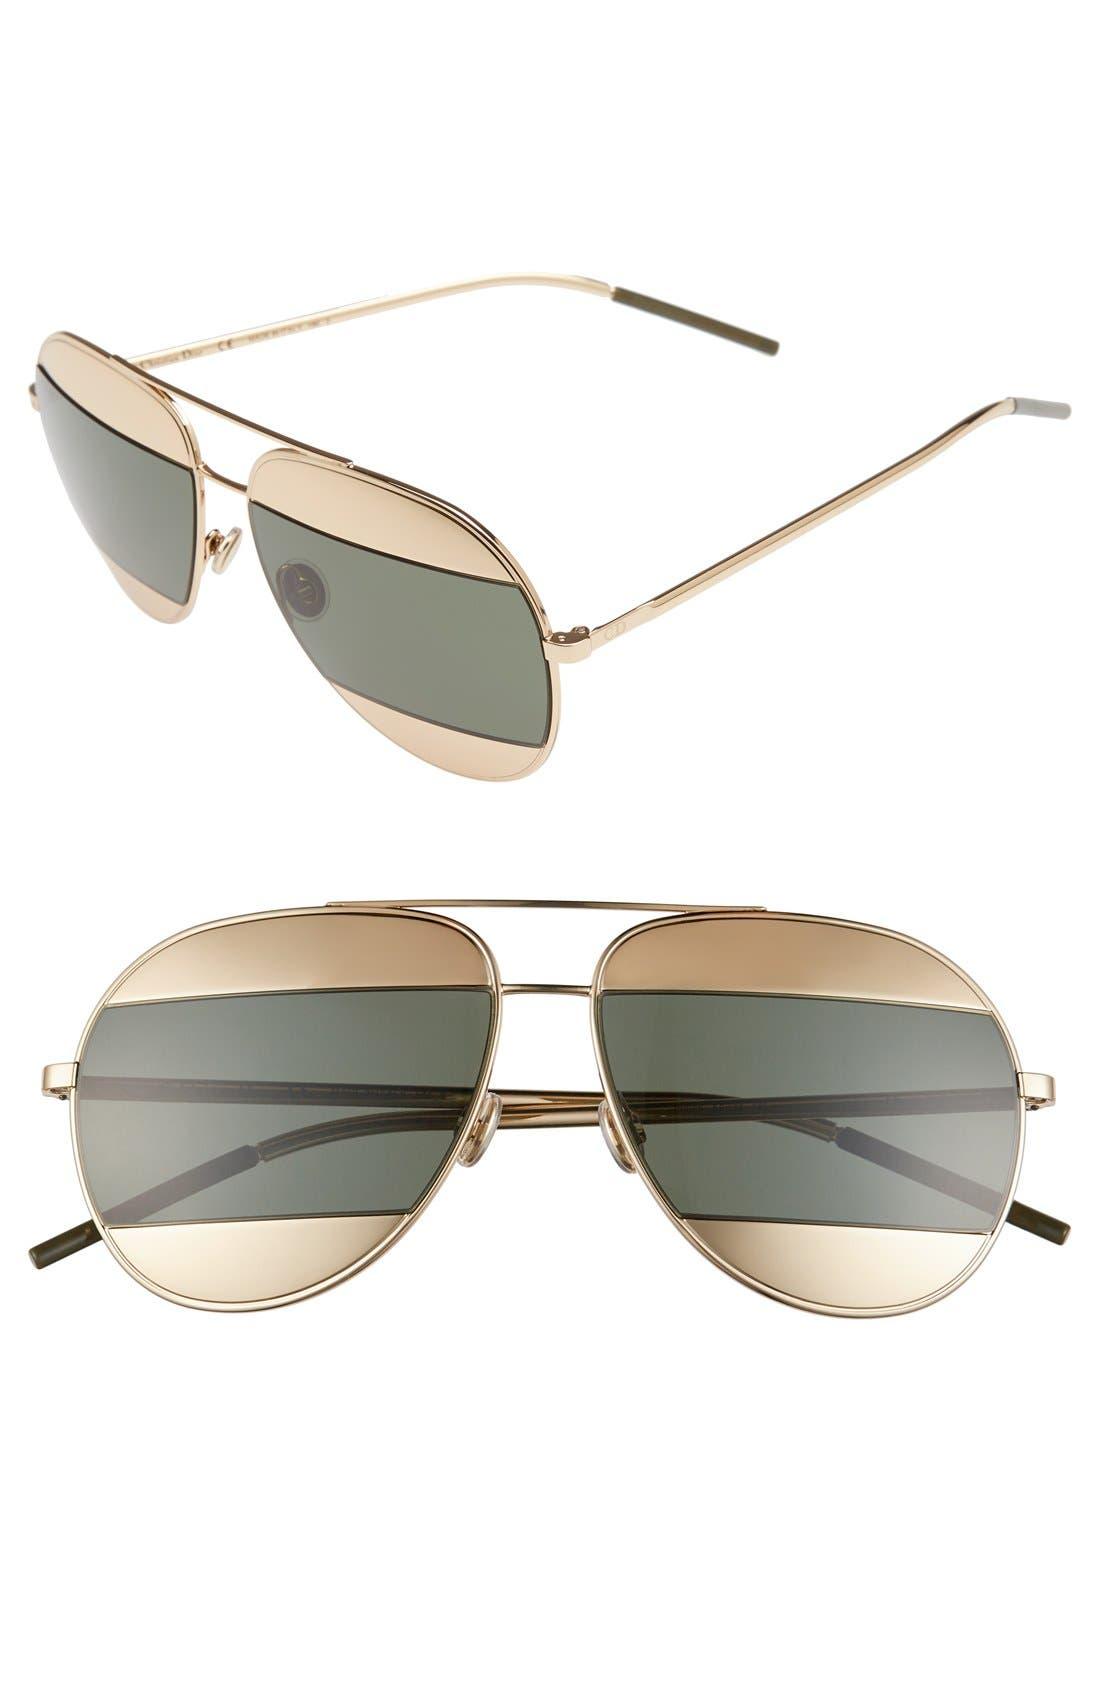 56efd3c78d3 Dior Split 59mm Aviator Sunglasses